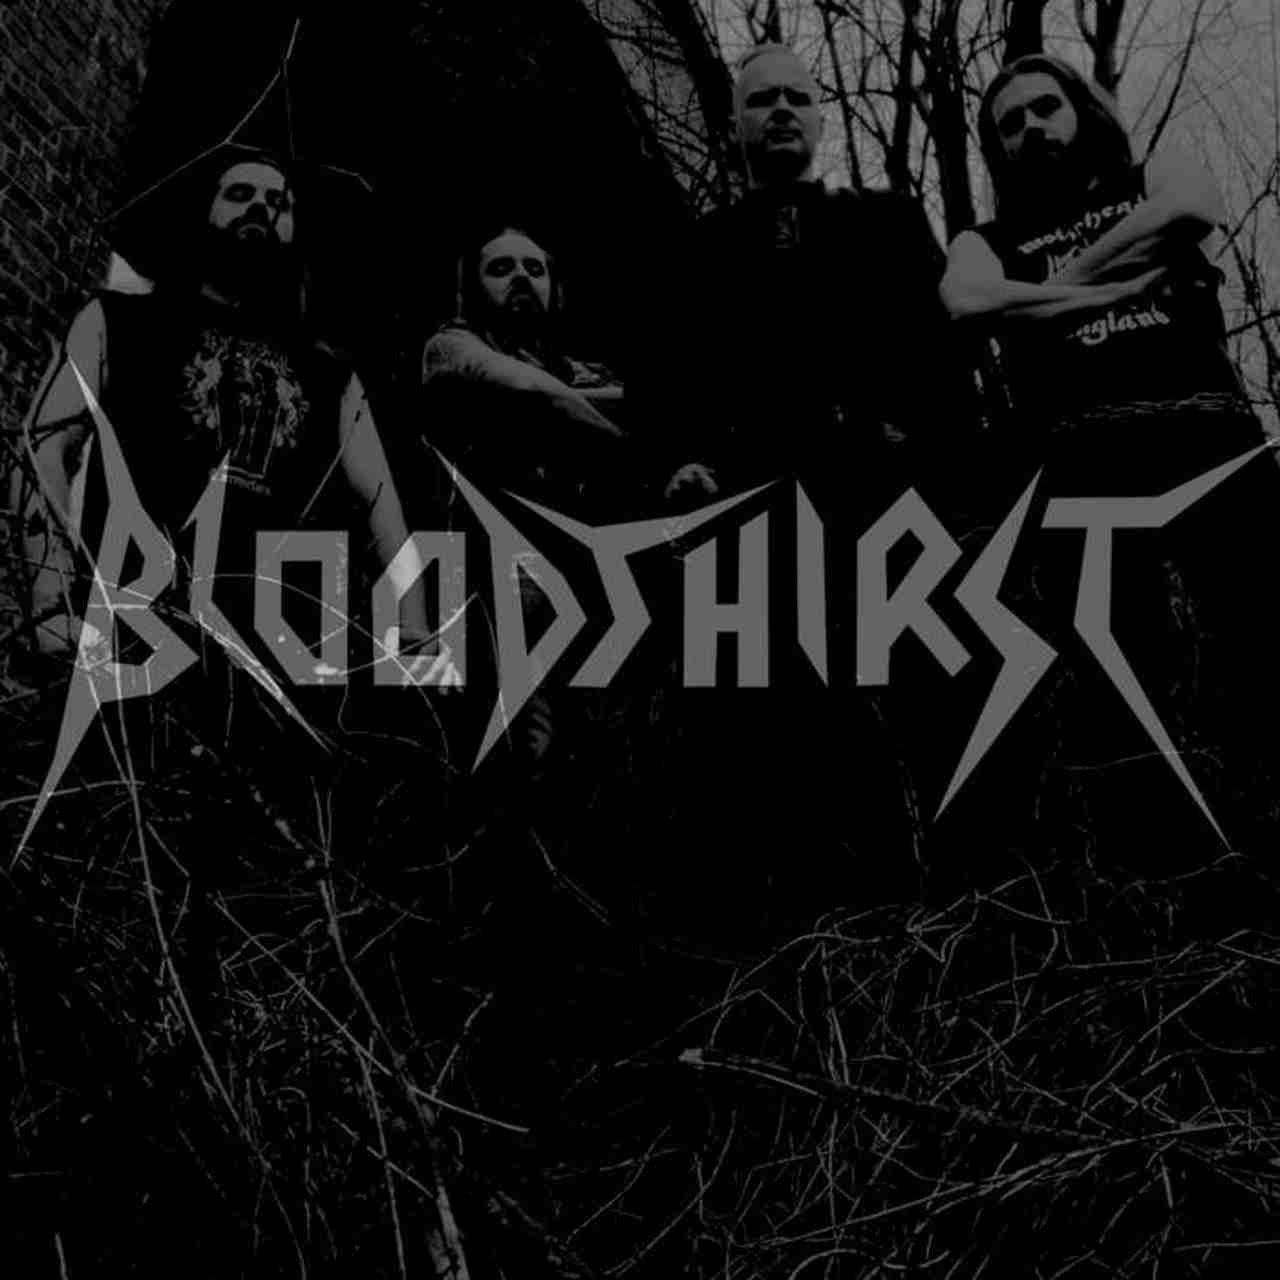 Bloodthirst - Promo 2017